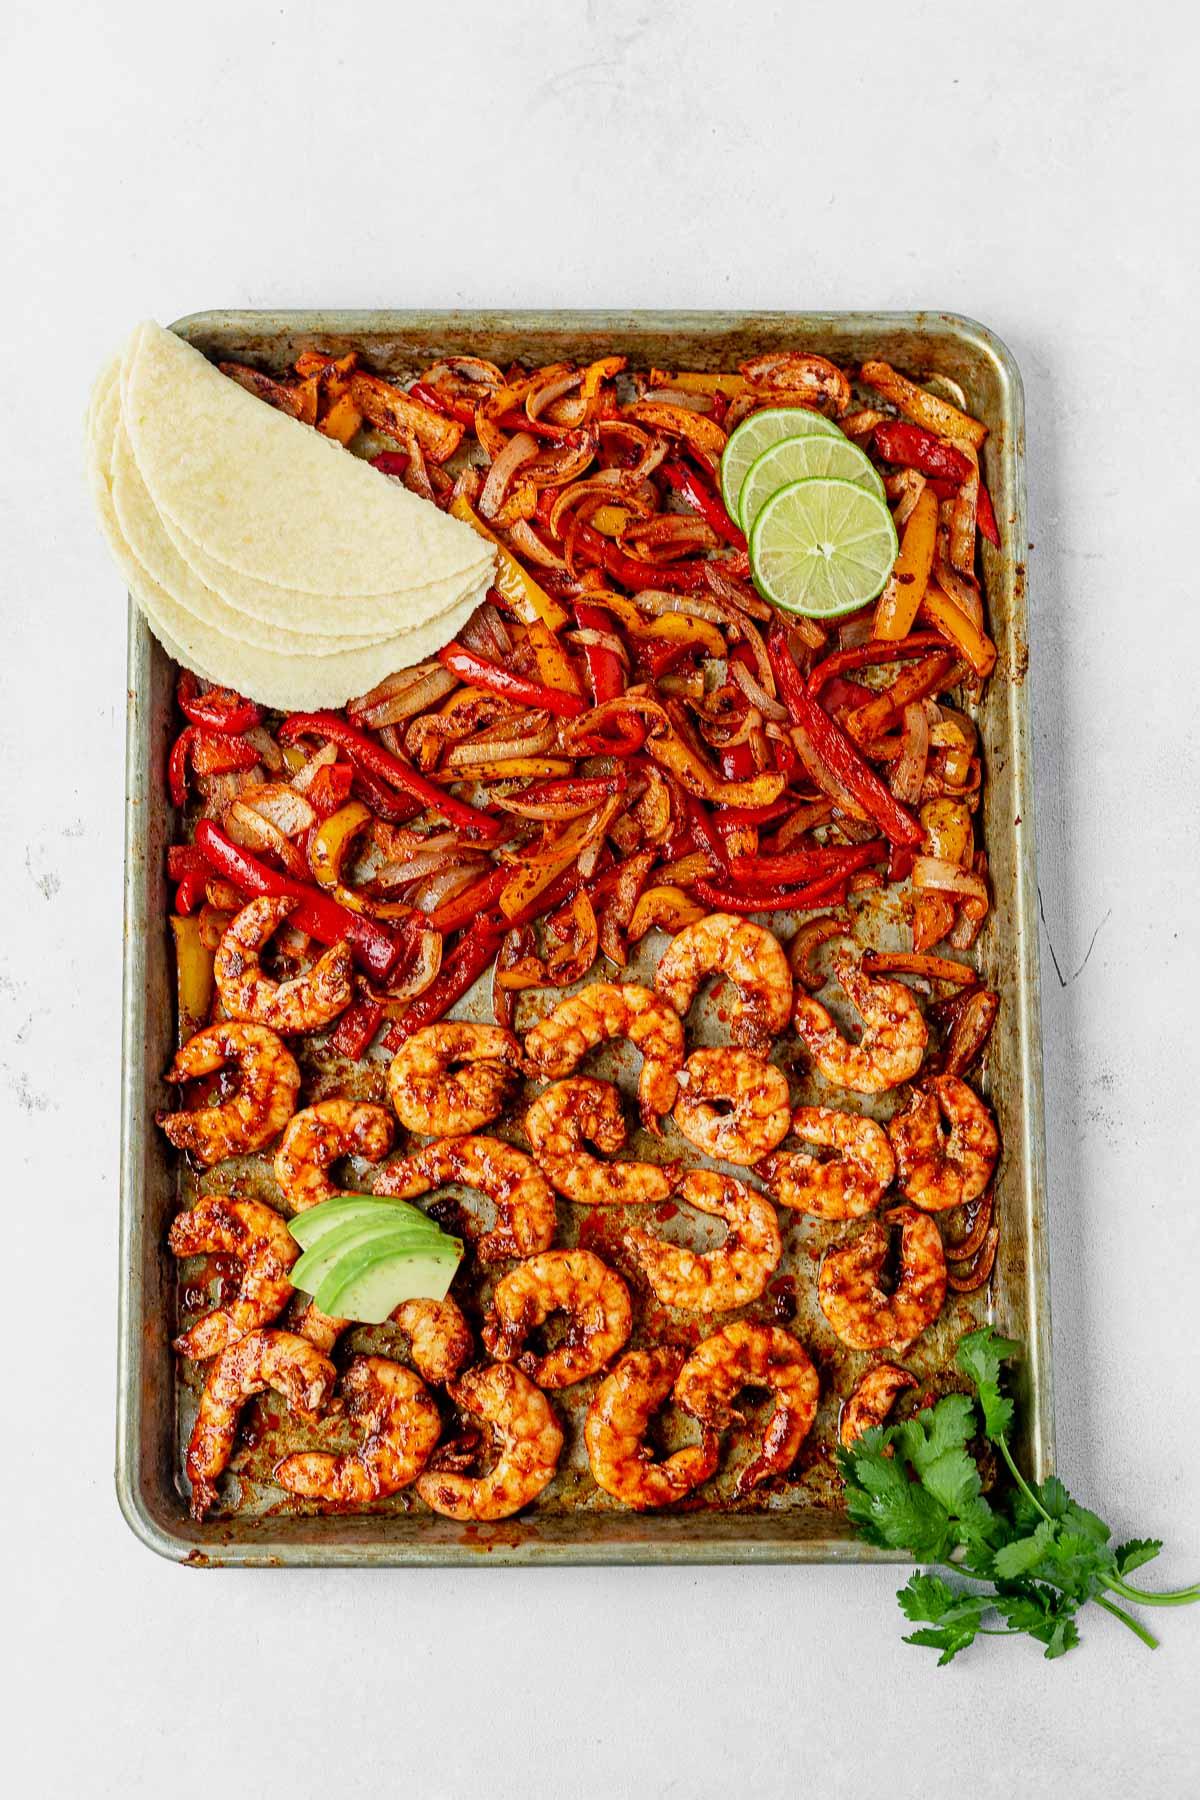 sheet pan shrimp fajitas with taco shells, avocado and cilantro on the side